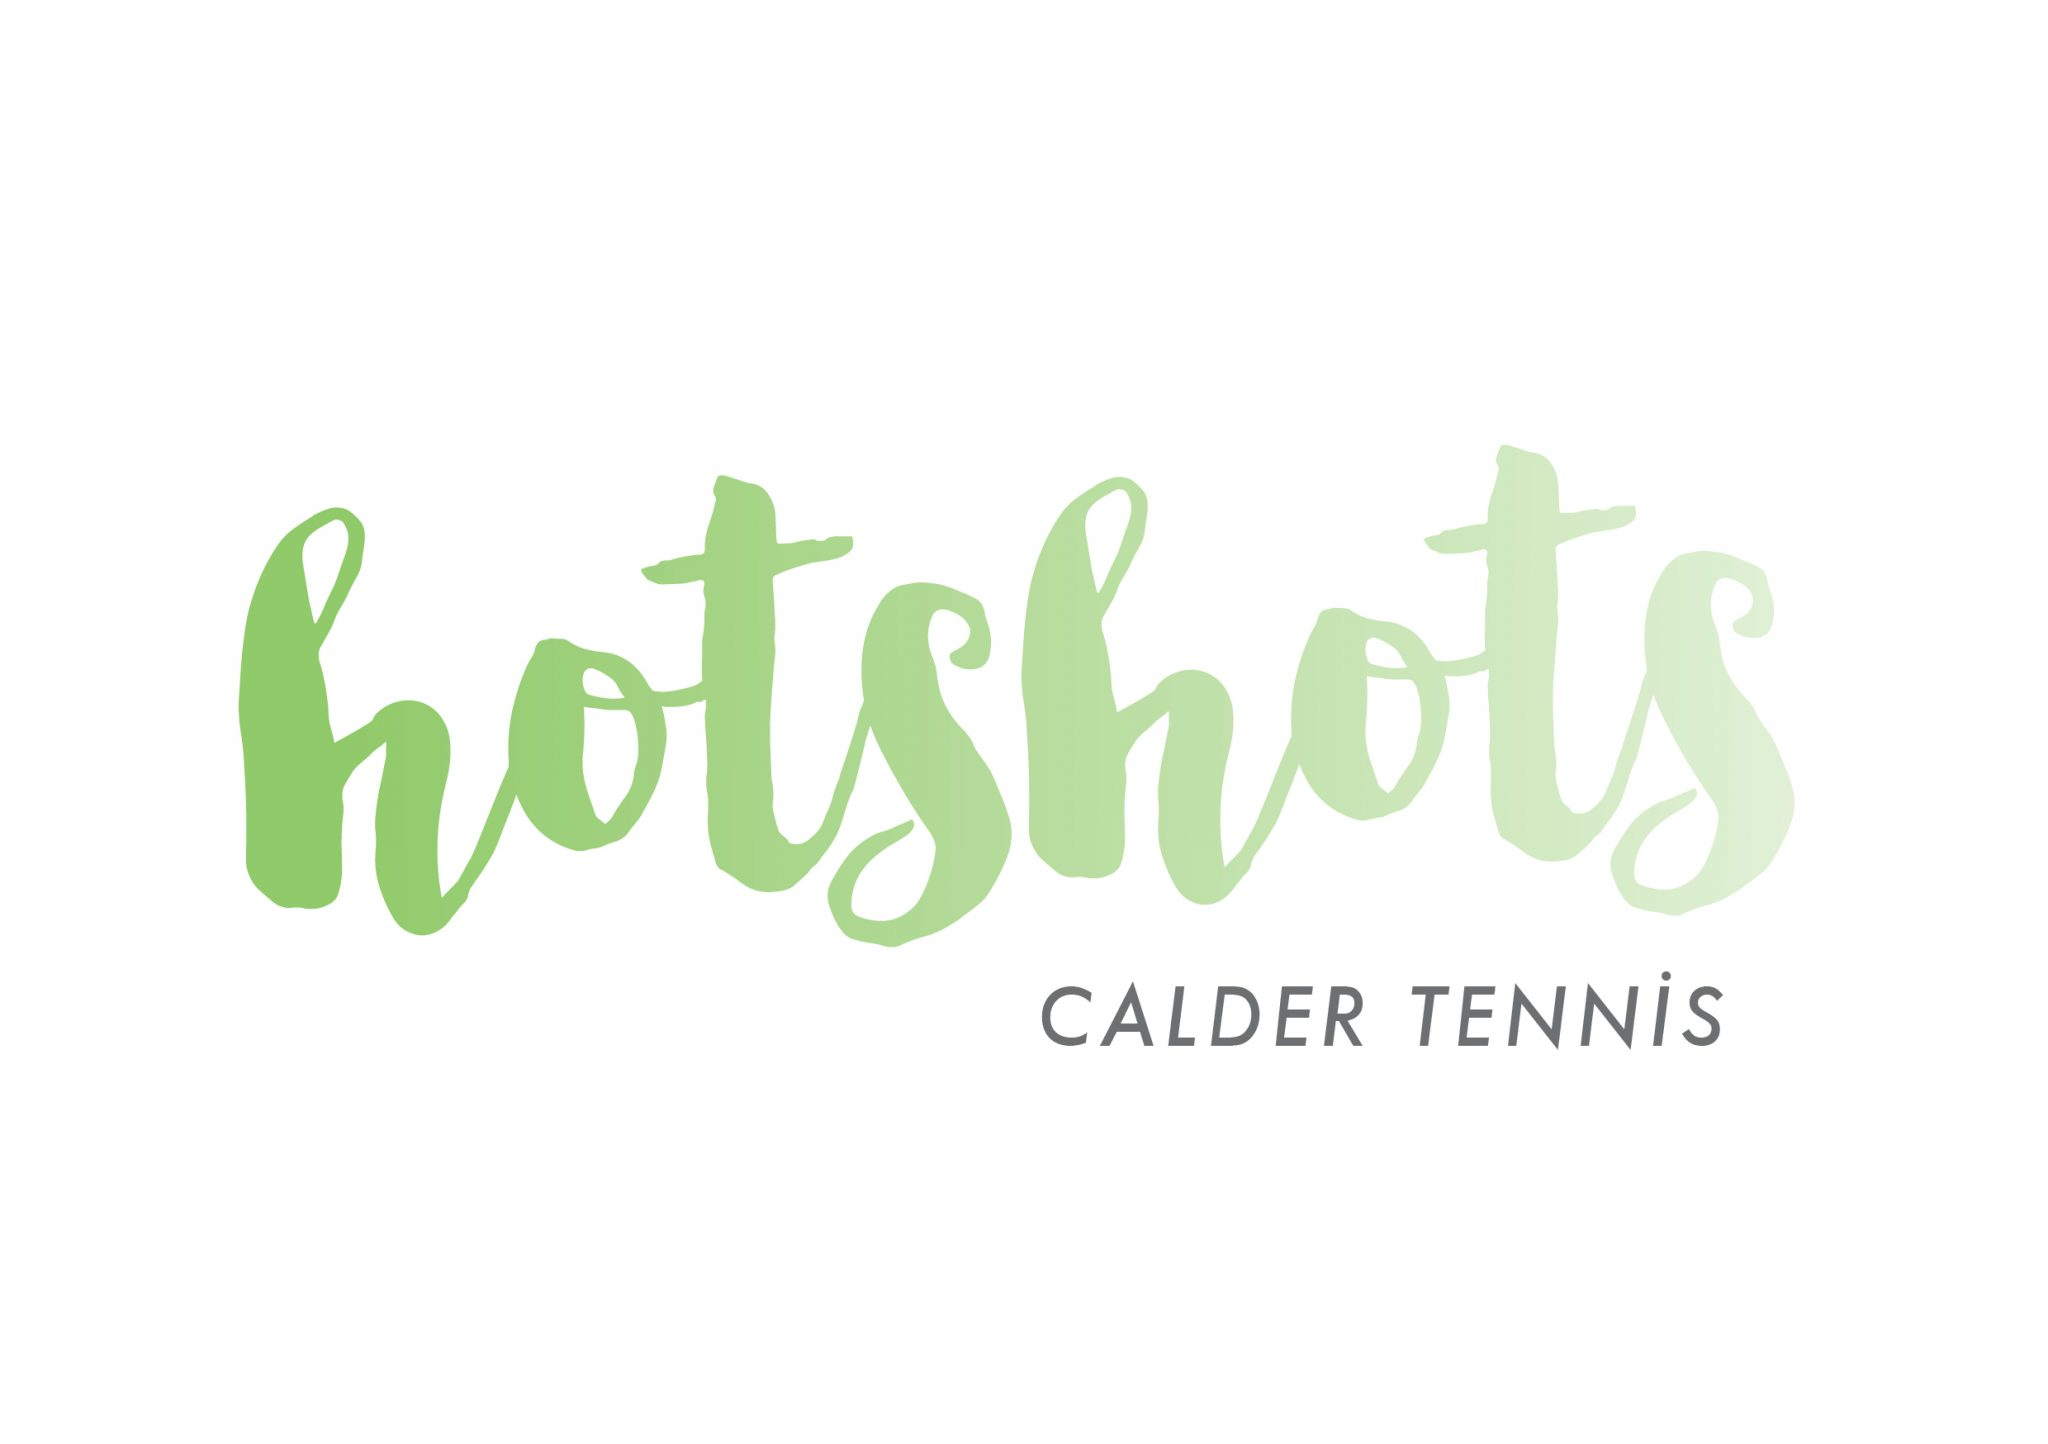 Calder Tennis Logos2